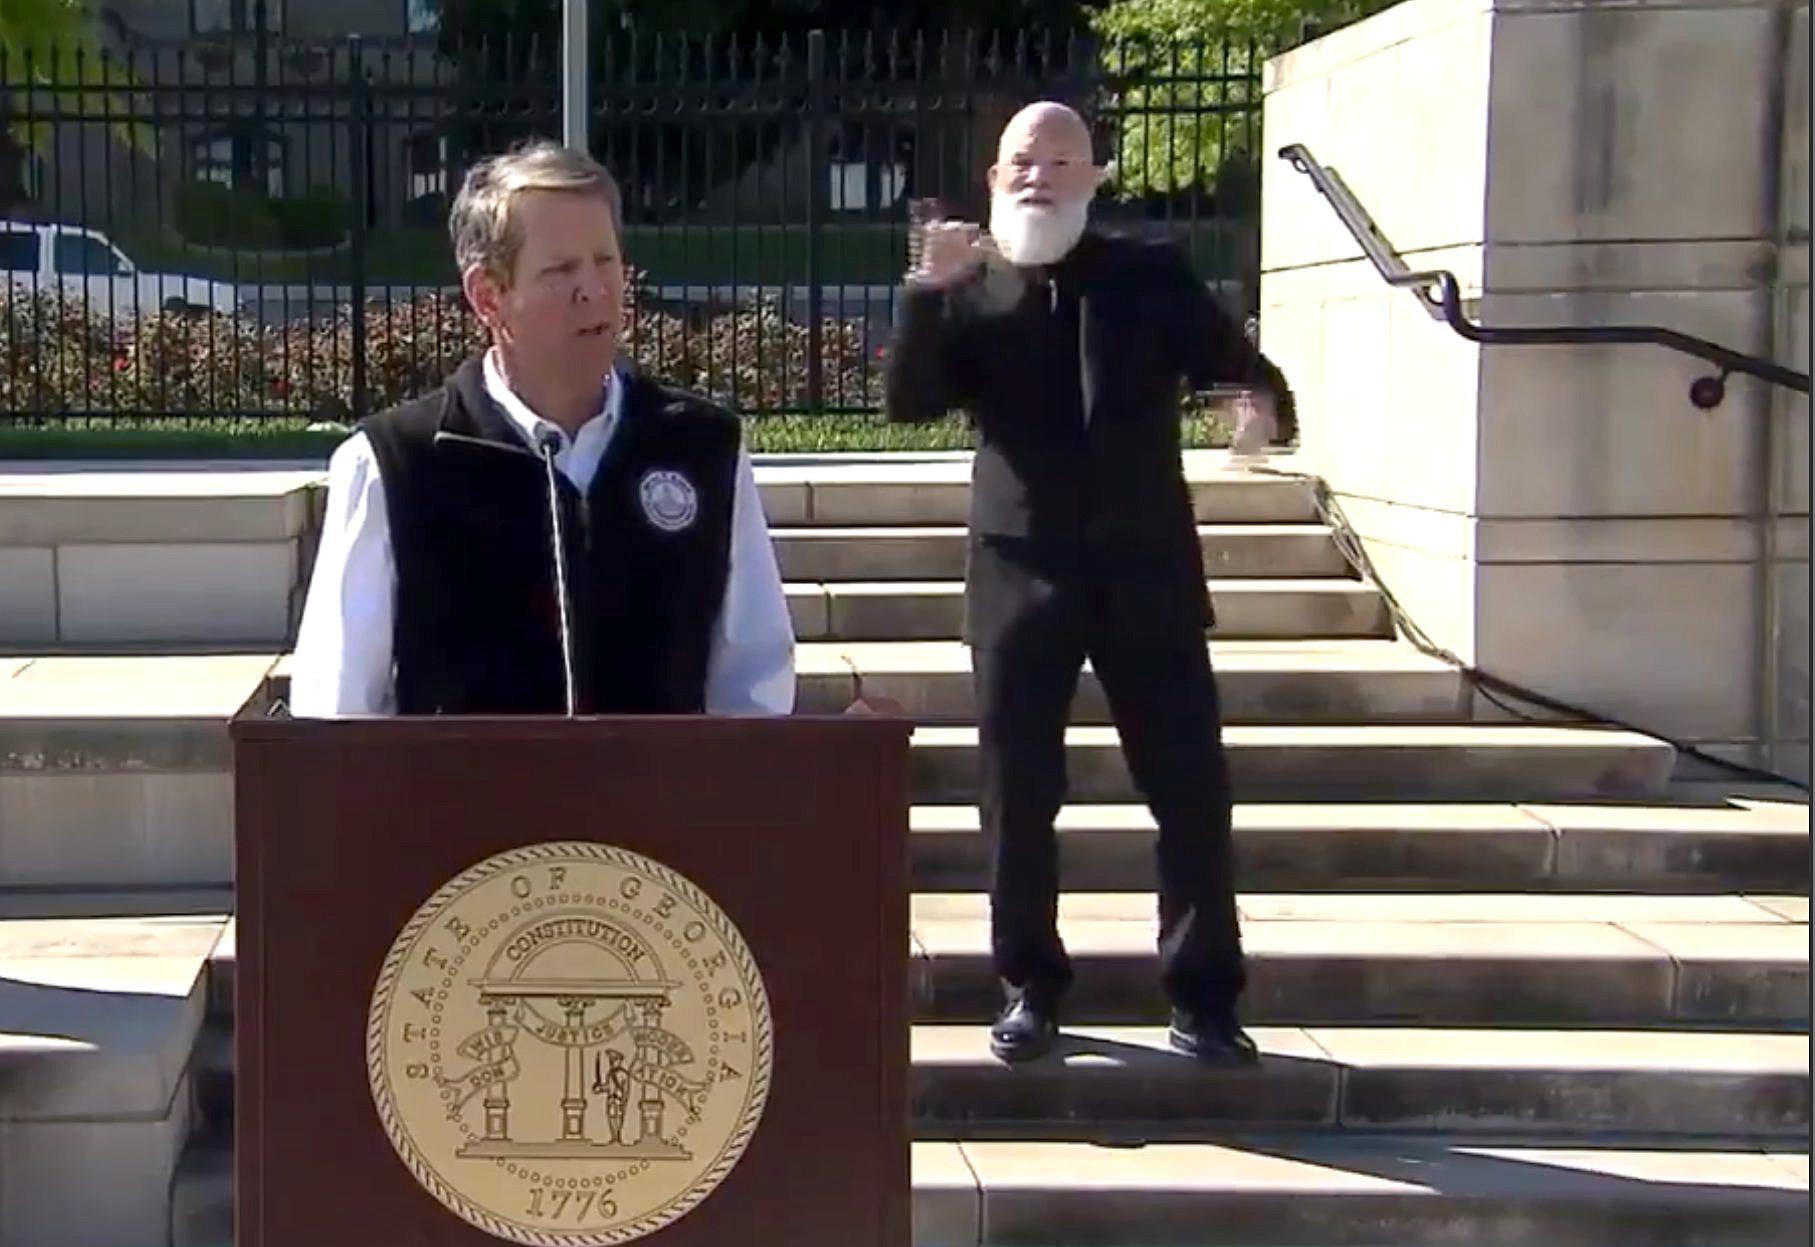 Sign language interpreter at Georgia governor's news conference looks like David Letterman, internet says